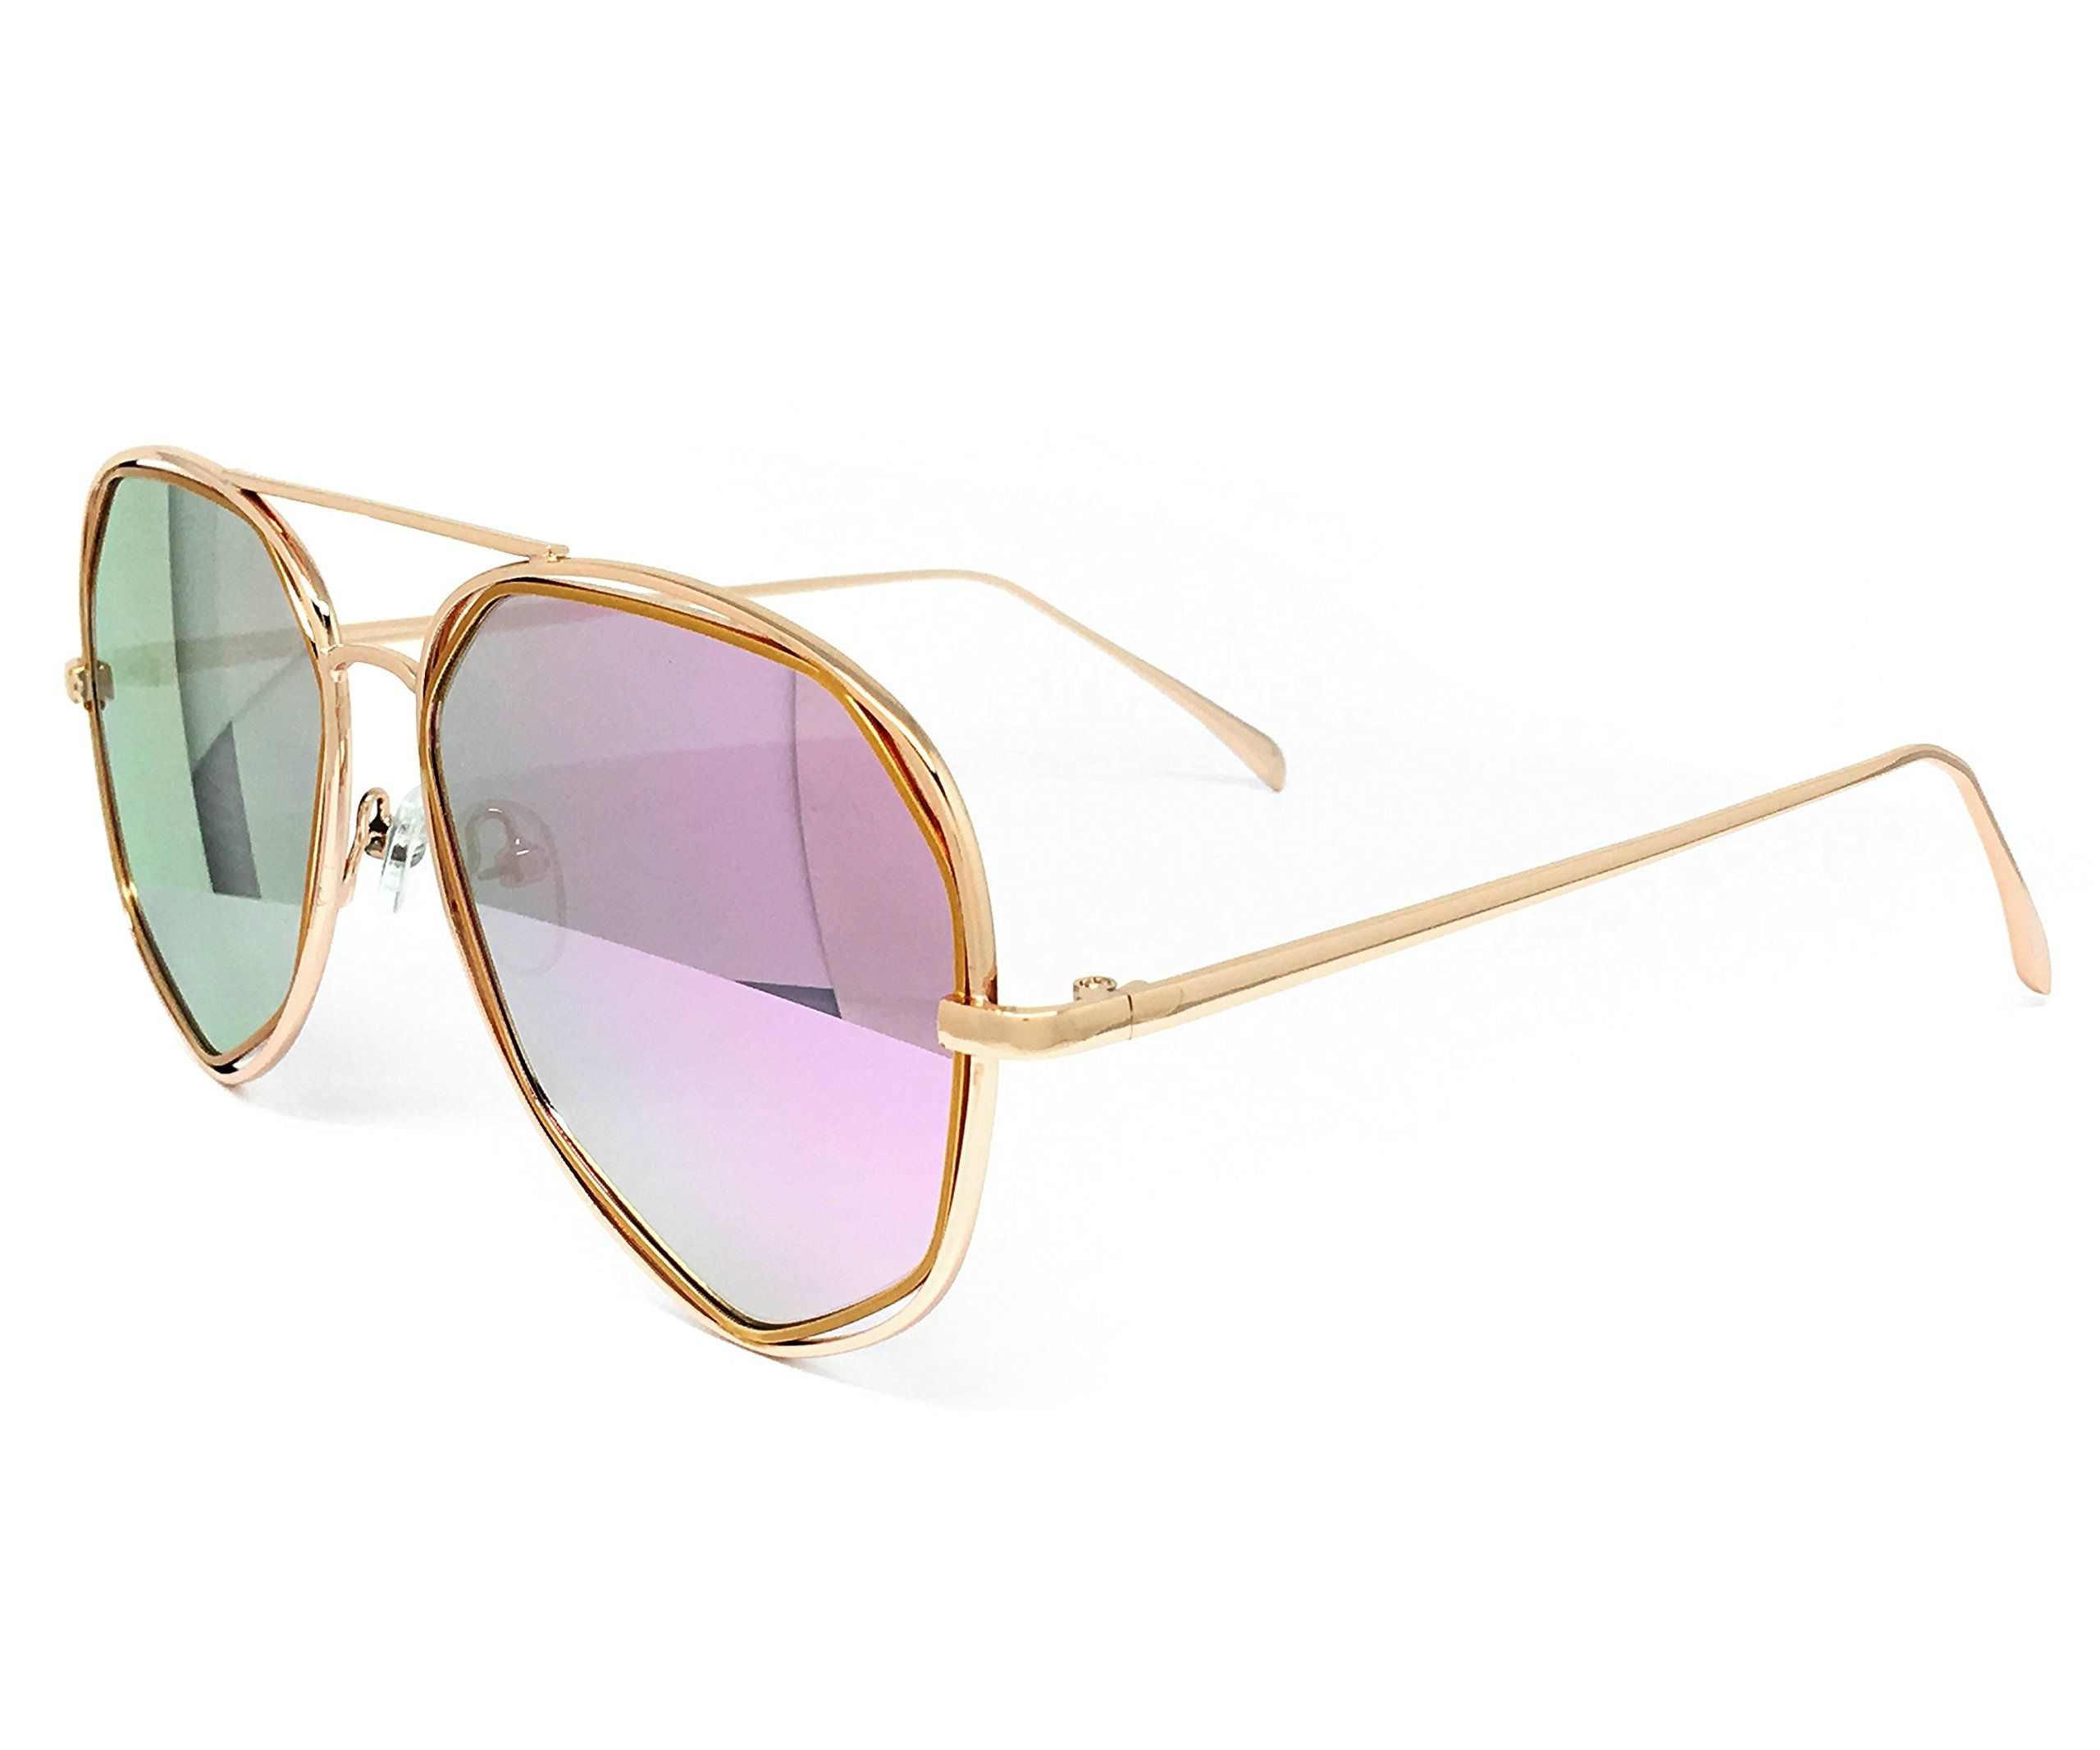 37b4b4f779848 O2 Eyewear 6554 Premium Retro Womens Mens Mirror Funky Fashion Geometric  Revo Candy Flat Top Aviator